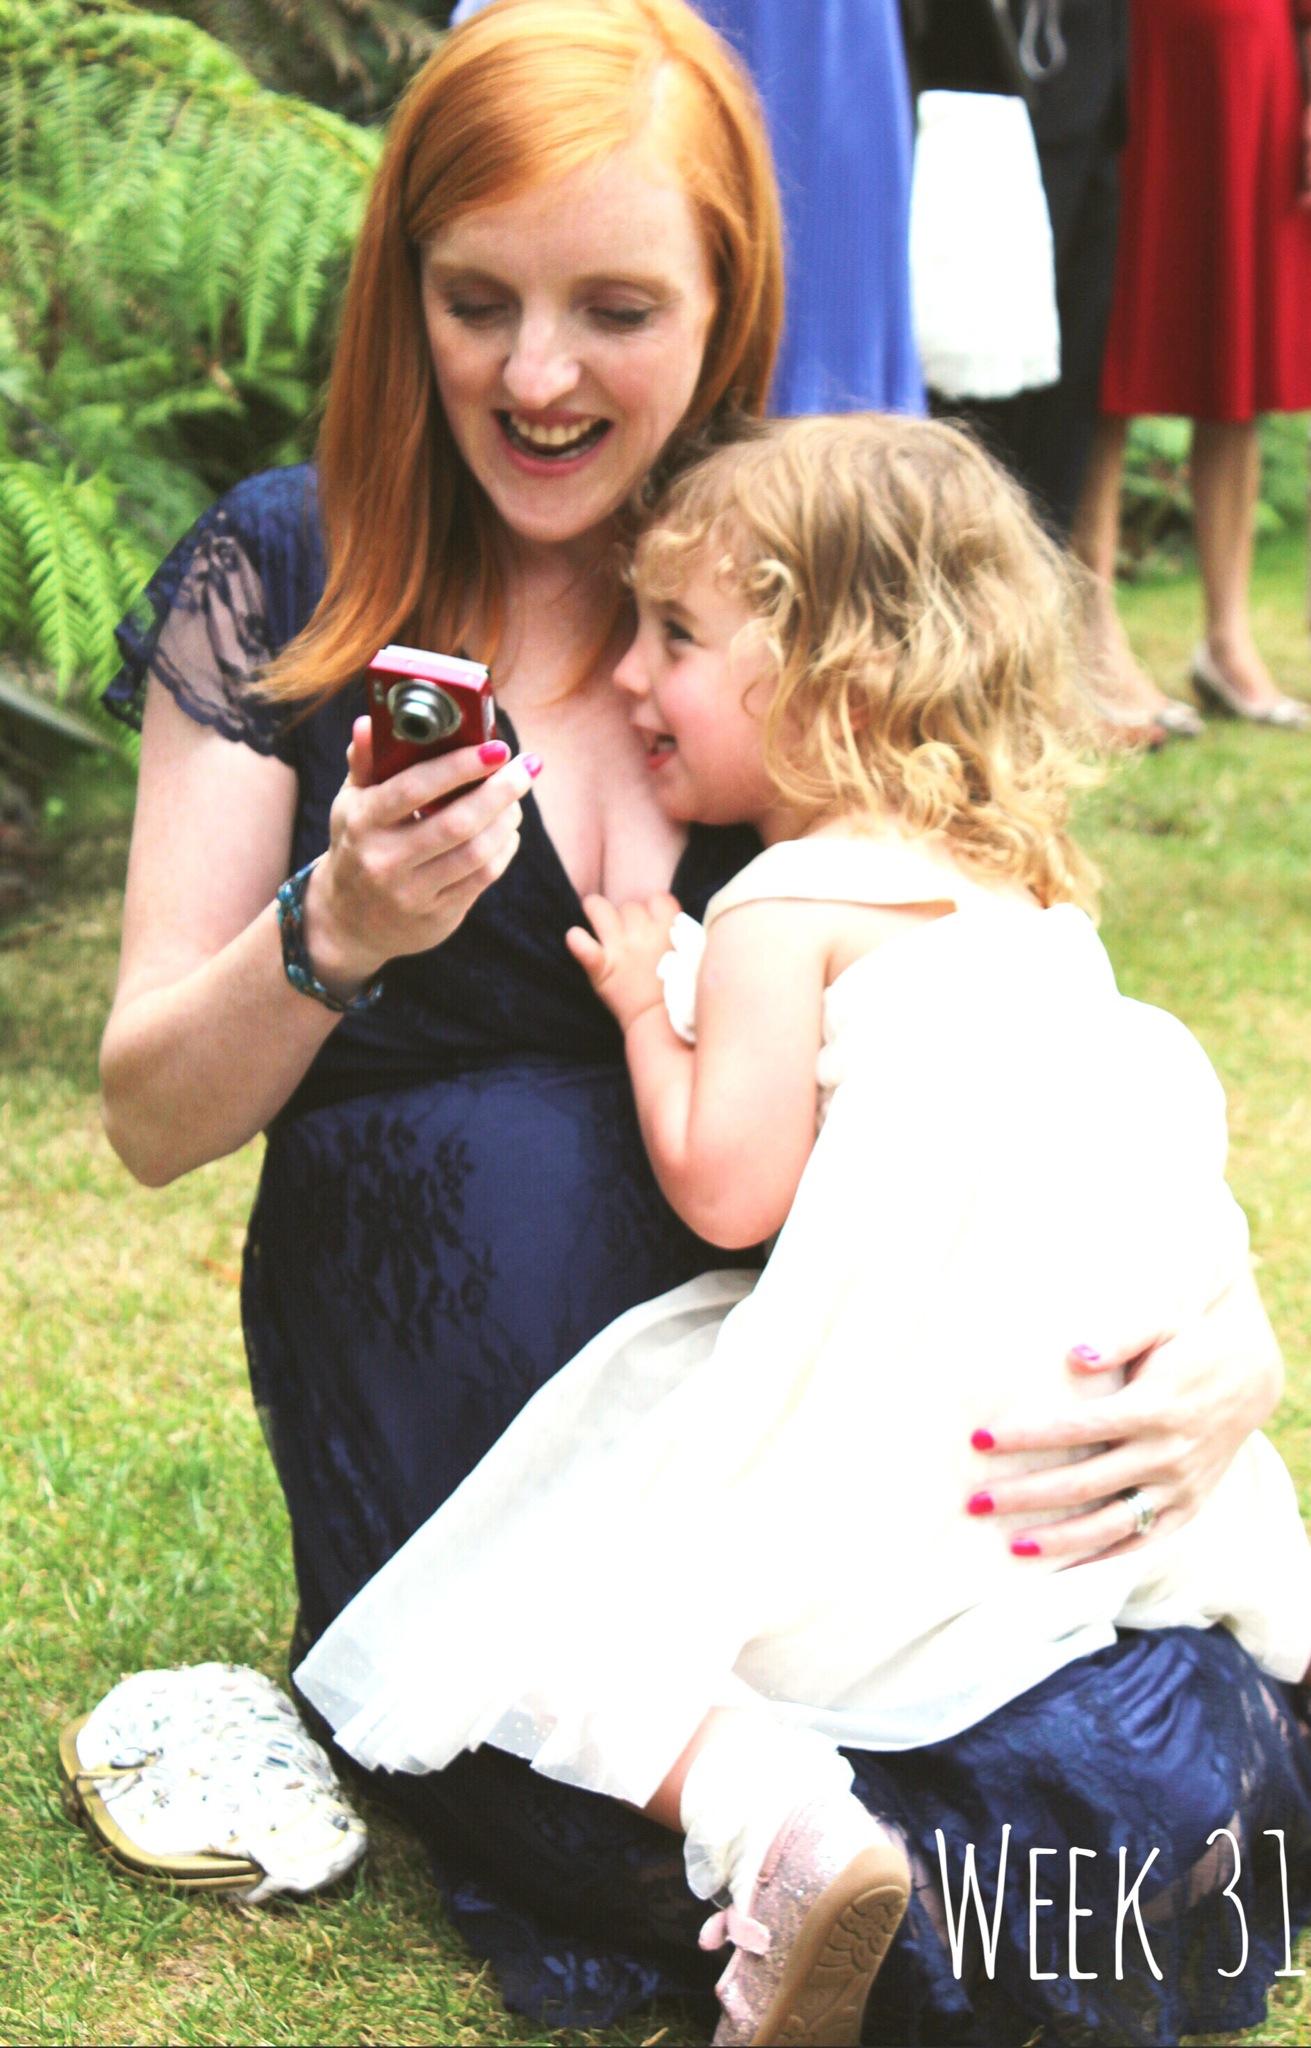 31 weeks pregnant: a wedding, a bridesmaid and a baby bump ...